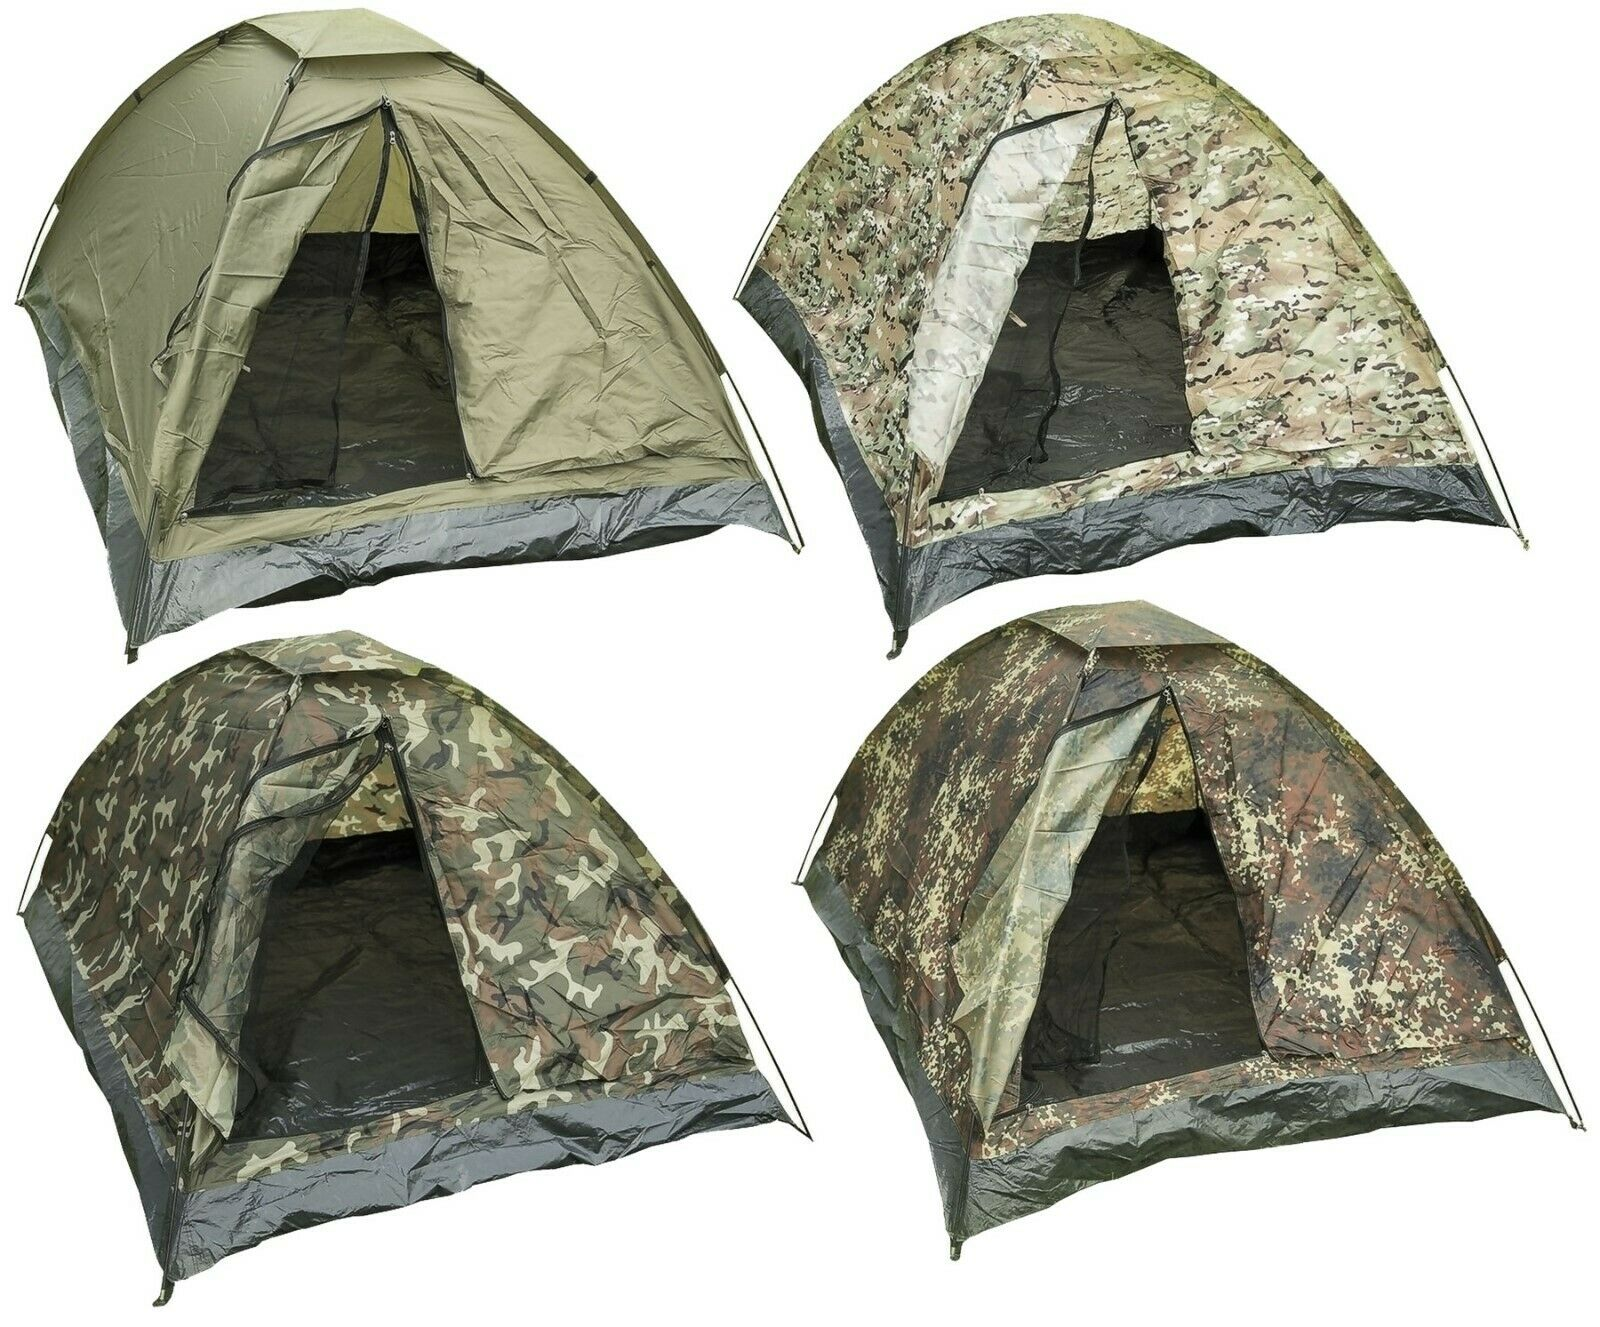 Zweimannzelt  IGLU STANDARD  Kuppelzelt Campingzelt Trekkingzelt Tarn Camouflage   big discount